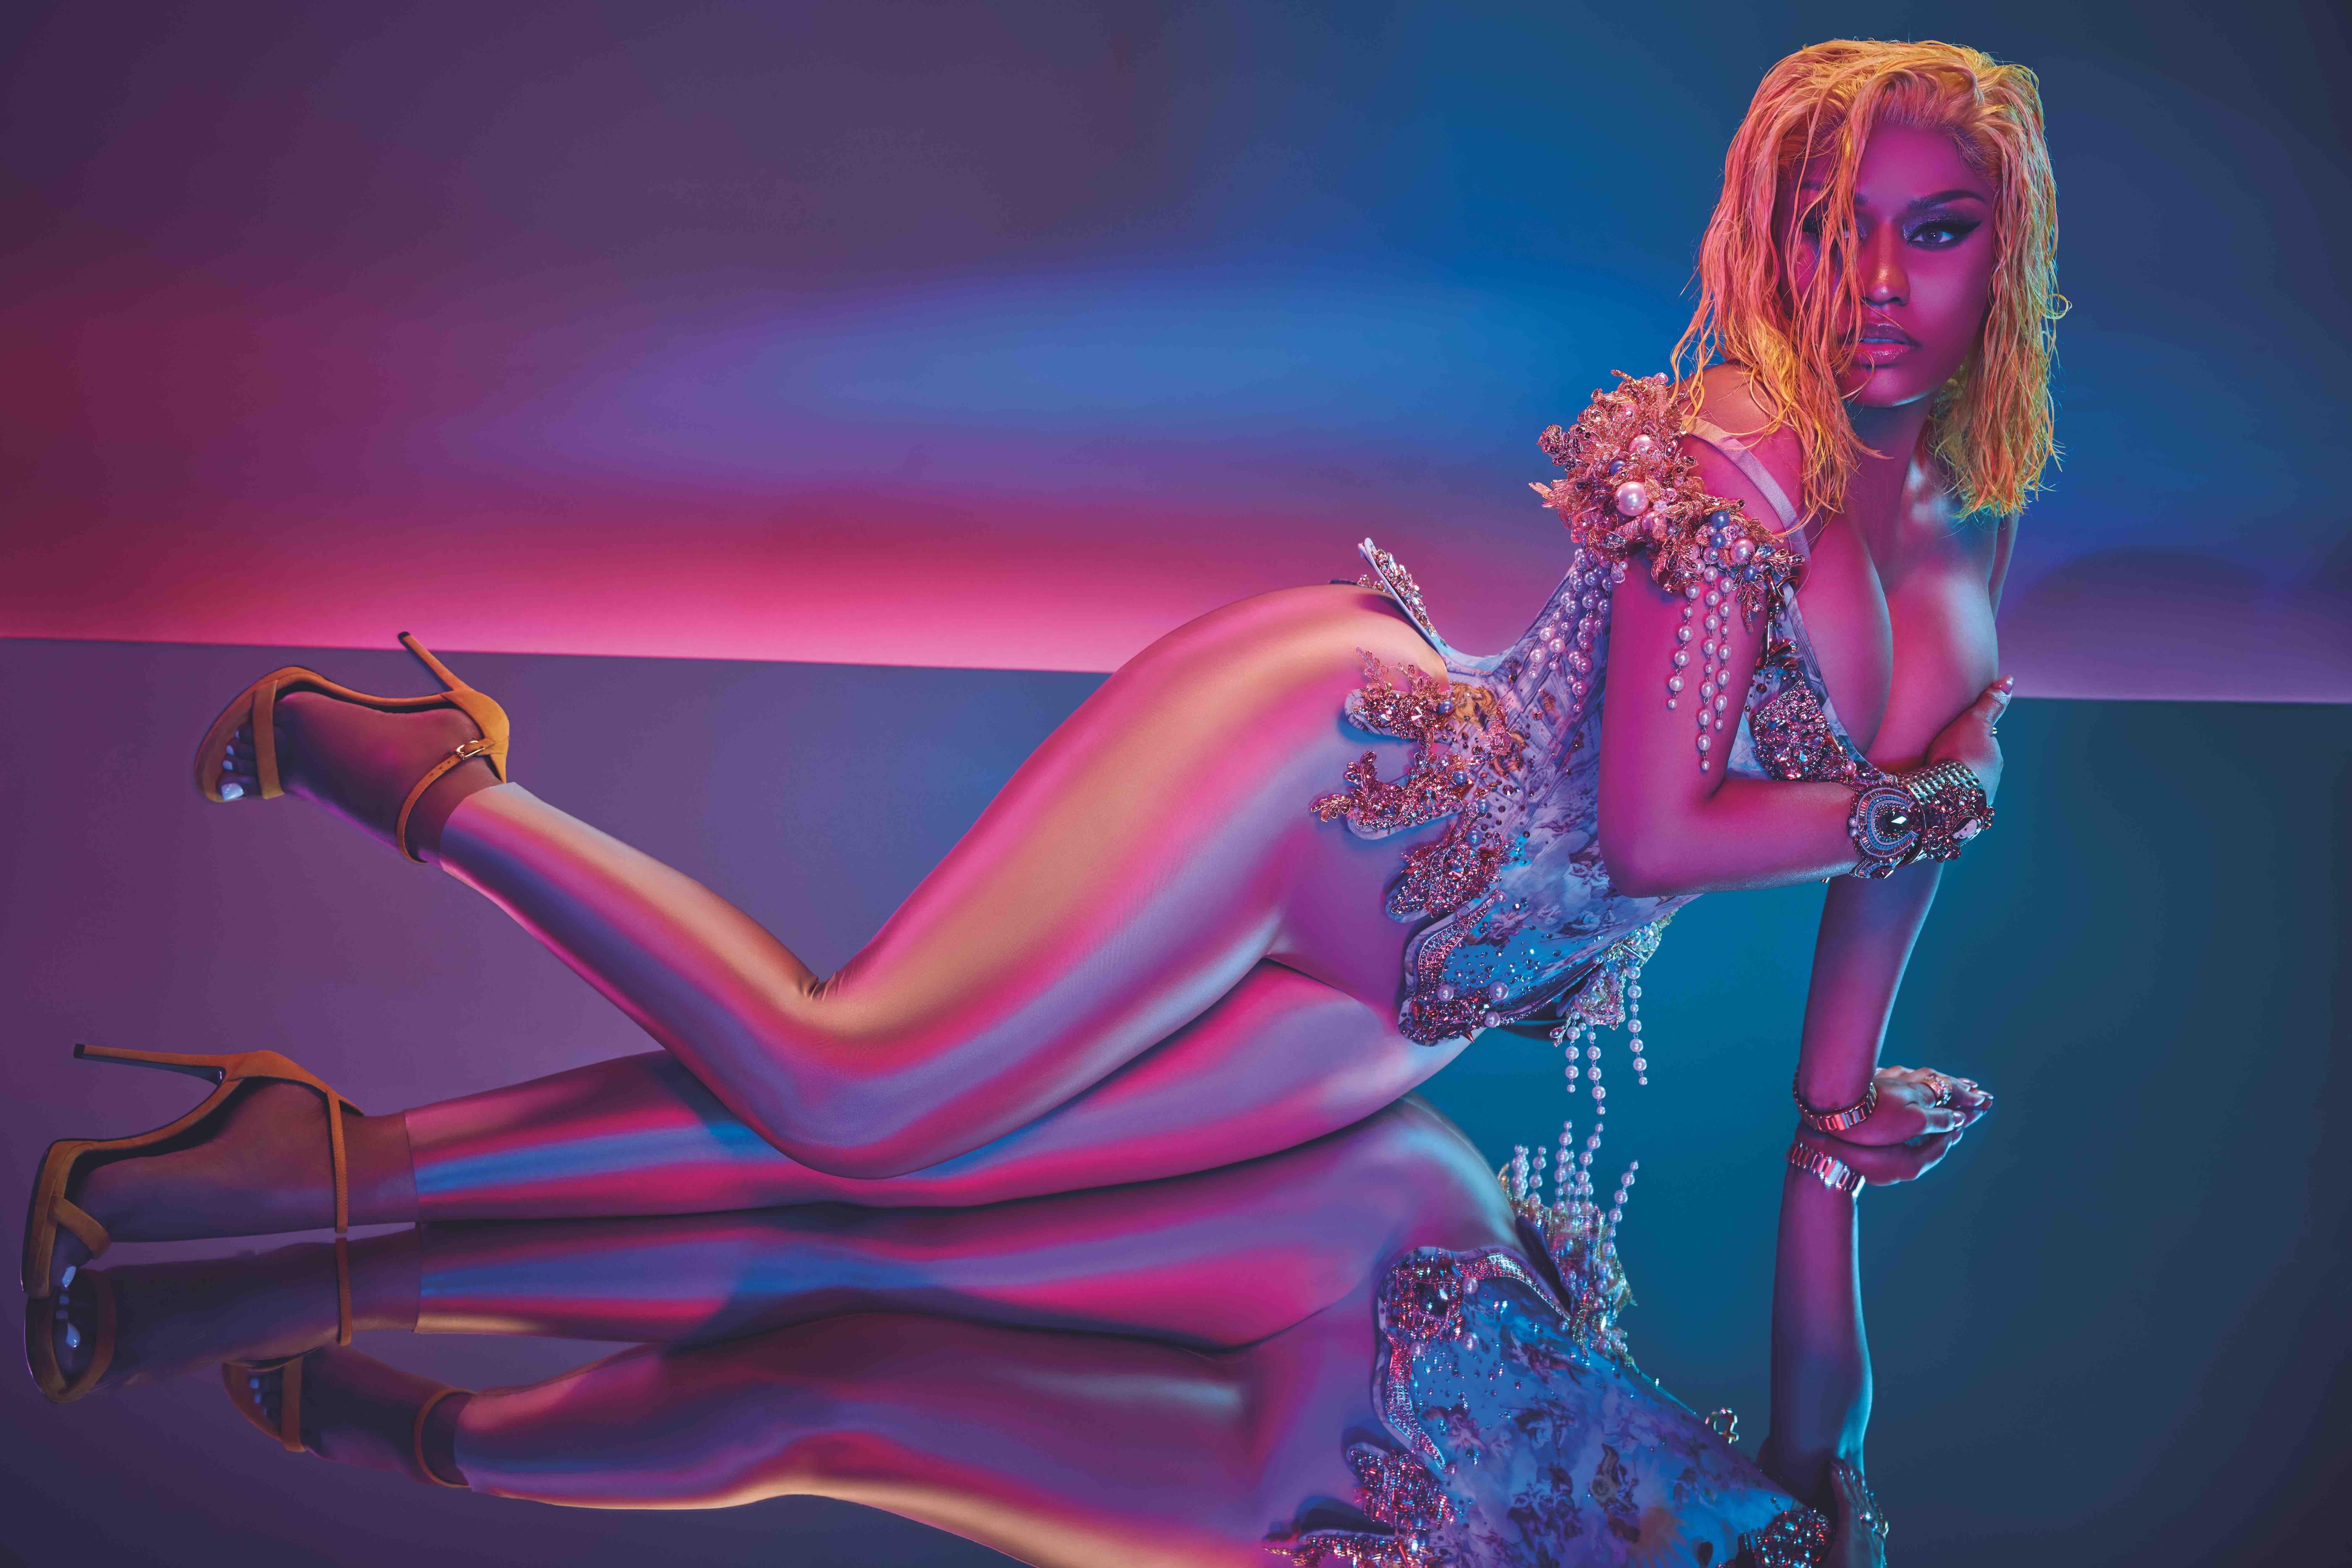 Platz 5: Nicki Minaj